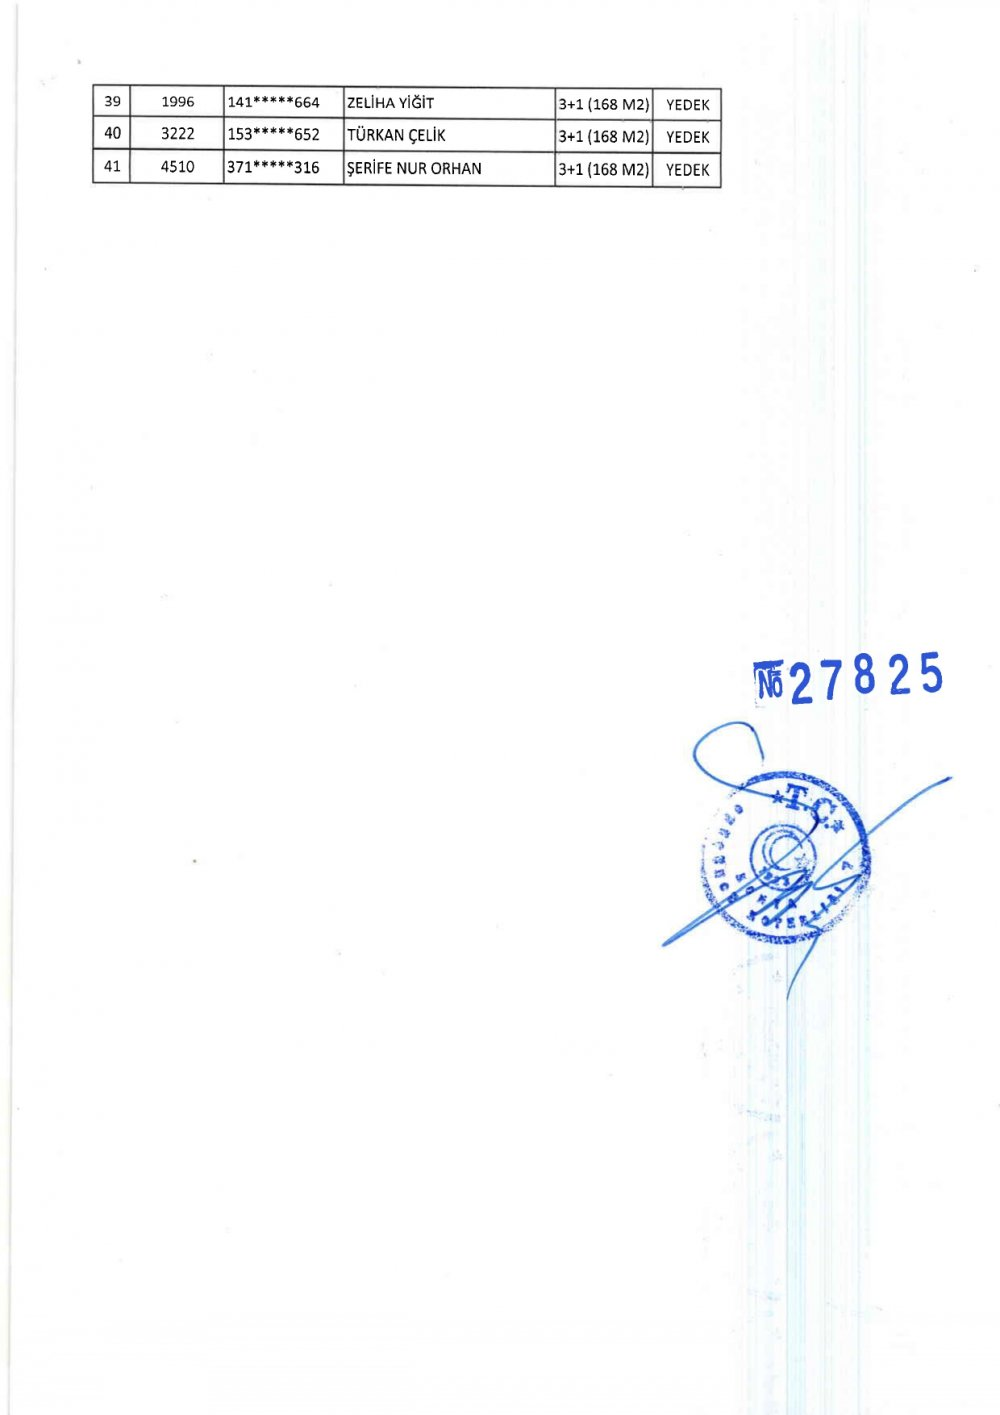 ss-turgutreis-evleri-kyk-kura-cekilis-listesi-page-0016.jpg